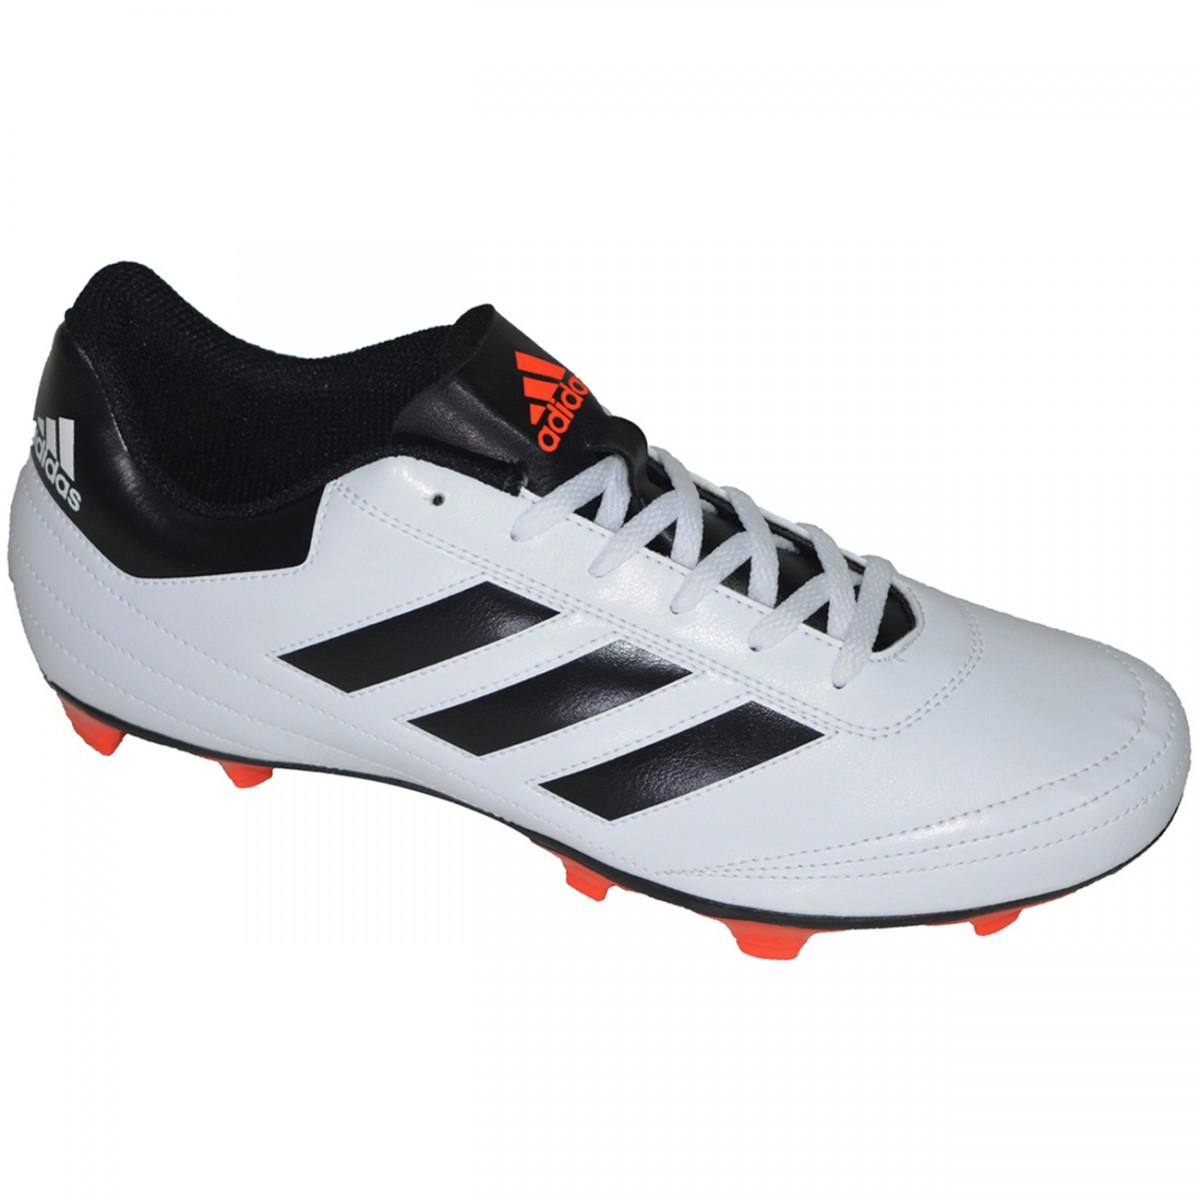 ac74305436 Chuteira Adidas Goletto VI AQ4282 - Branco Preto - Chuteira Nike ...